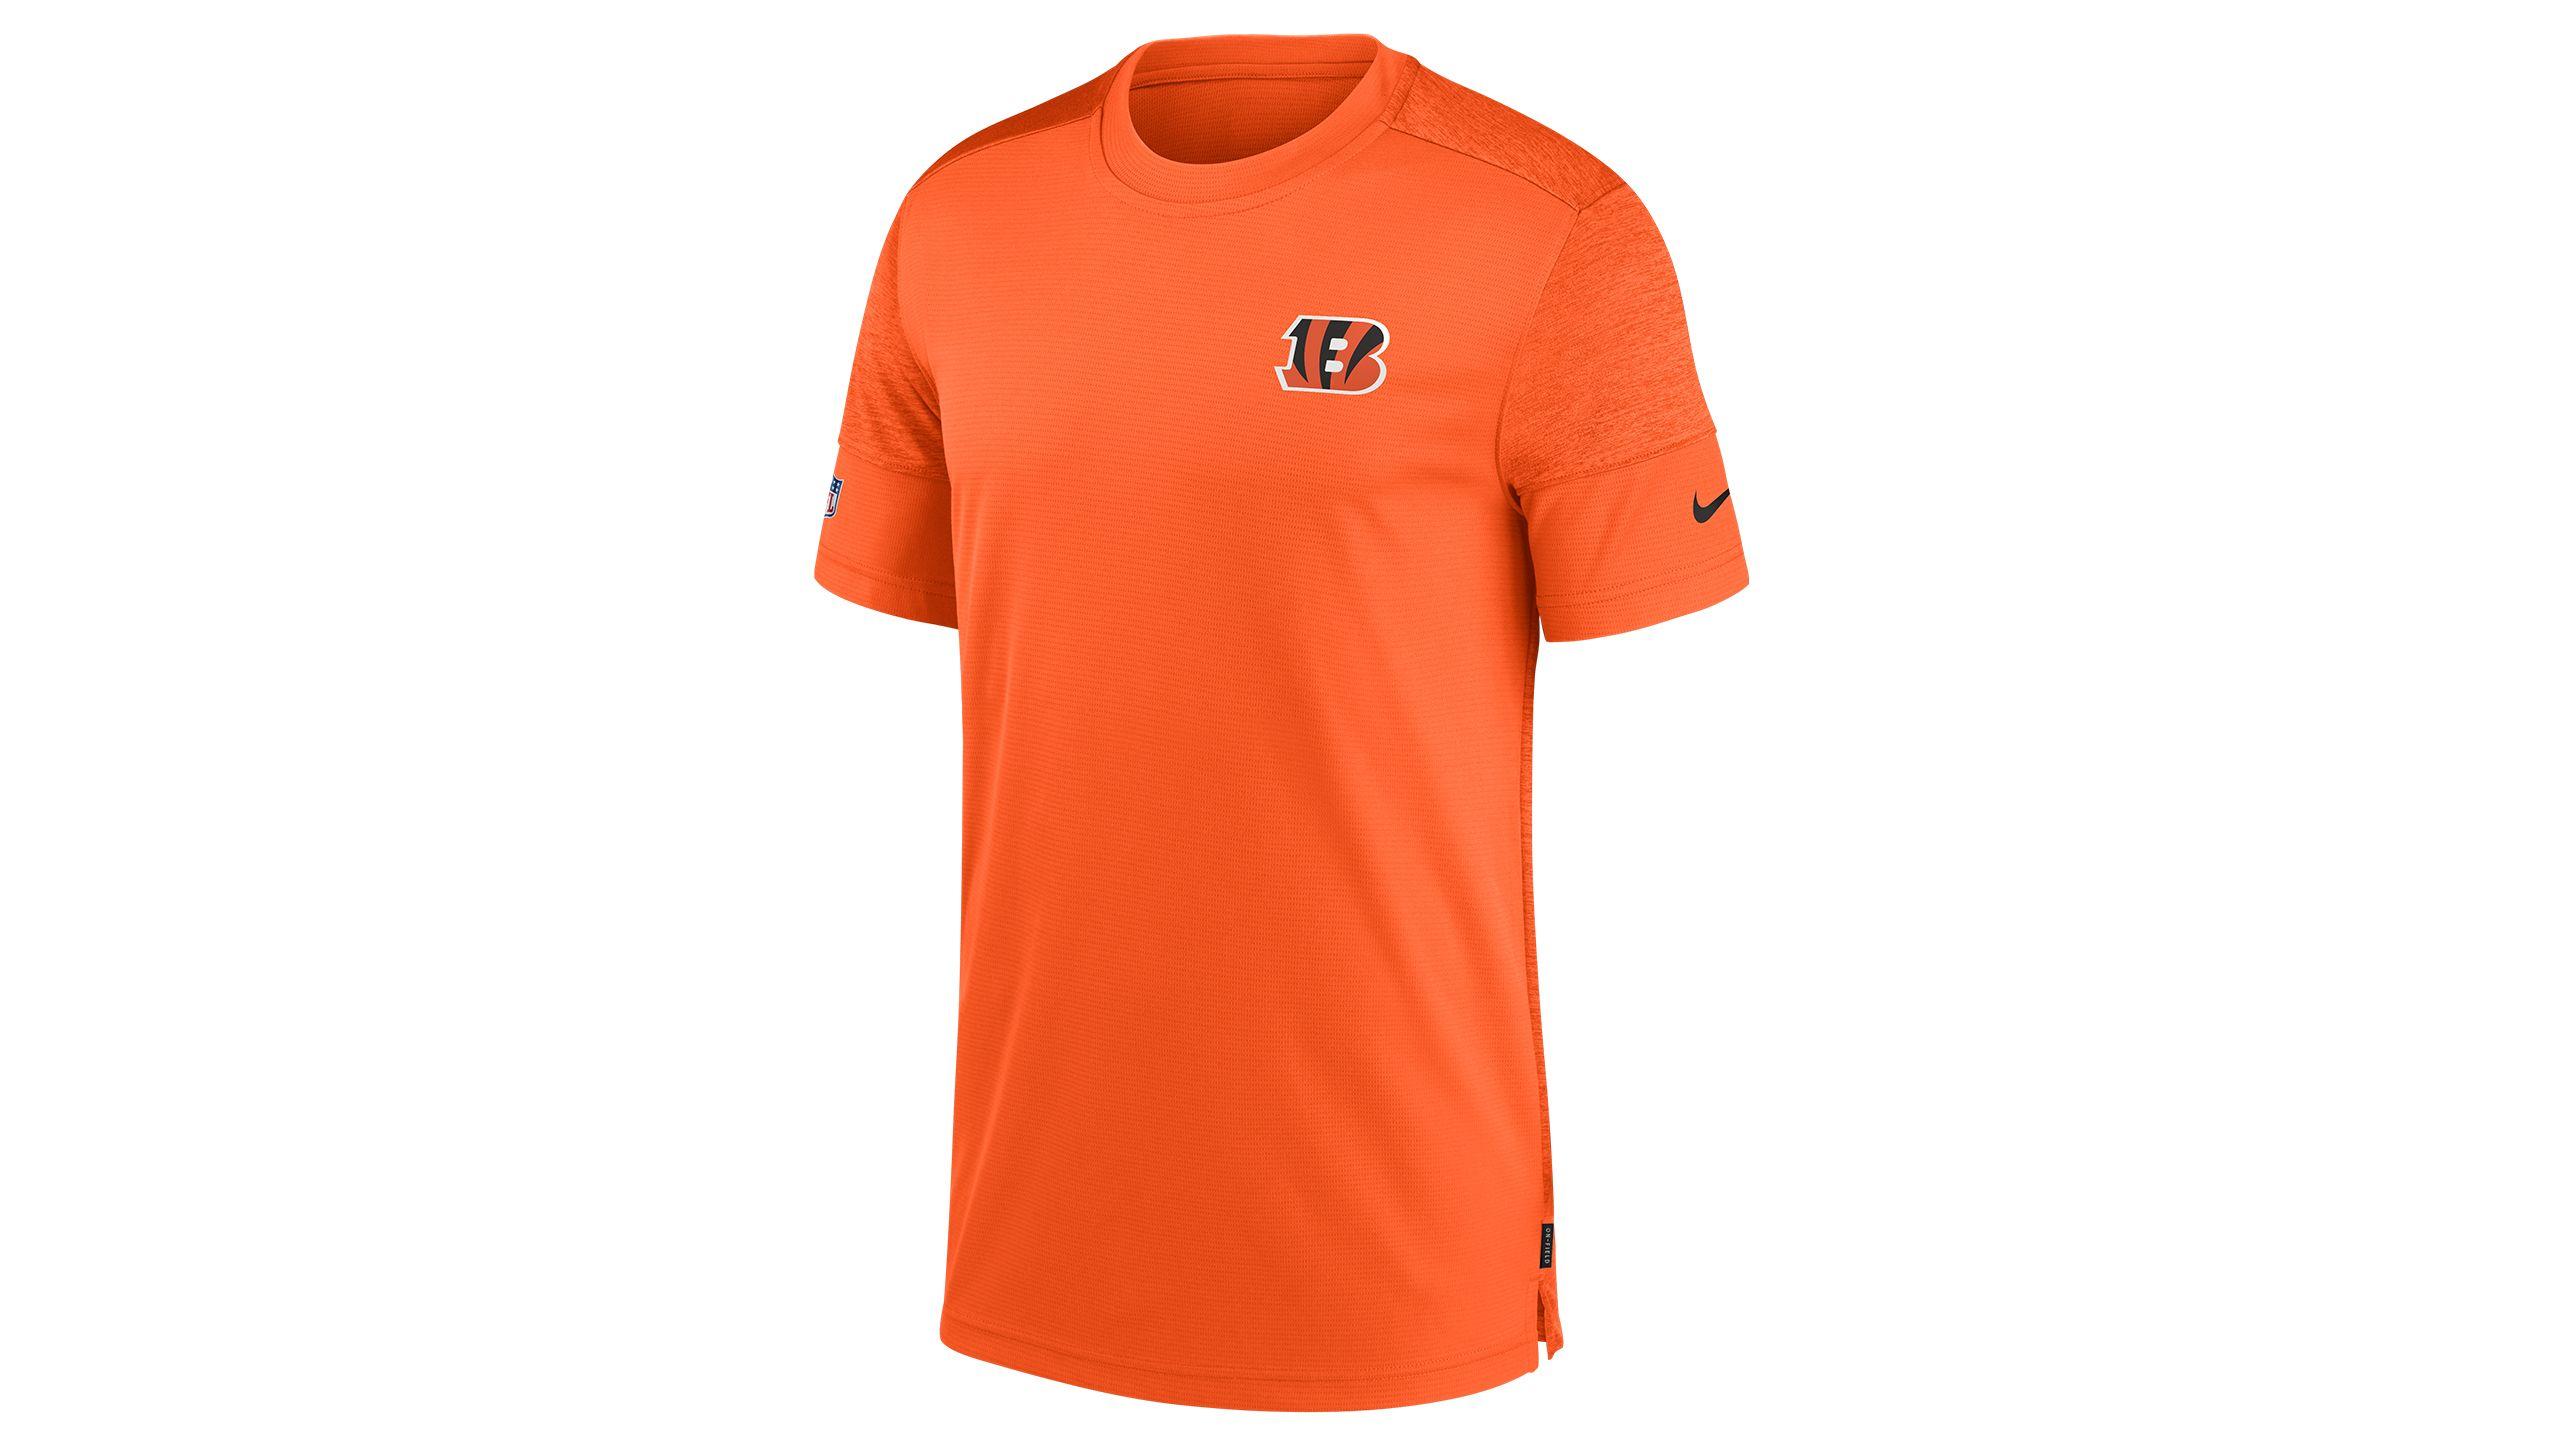 Nike Coach Top - Orange